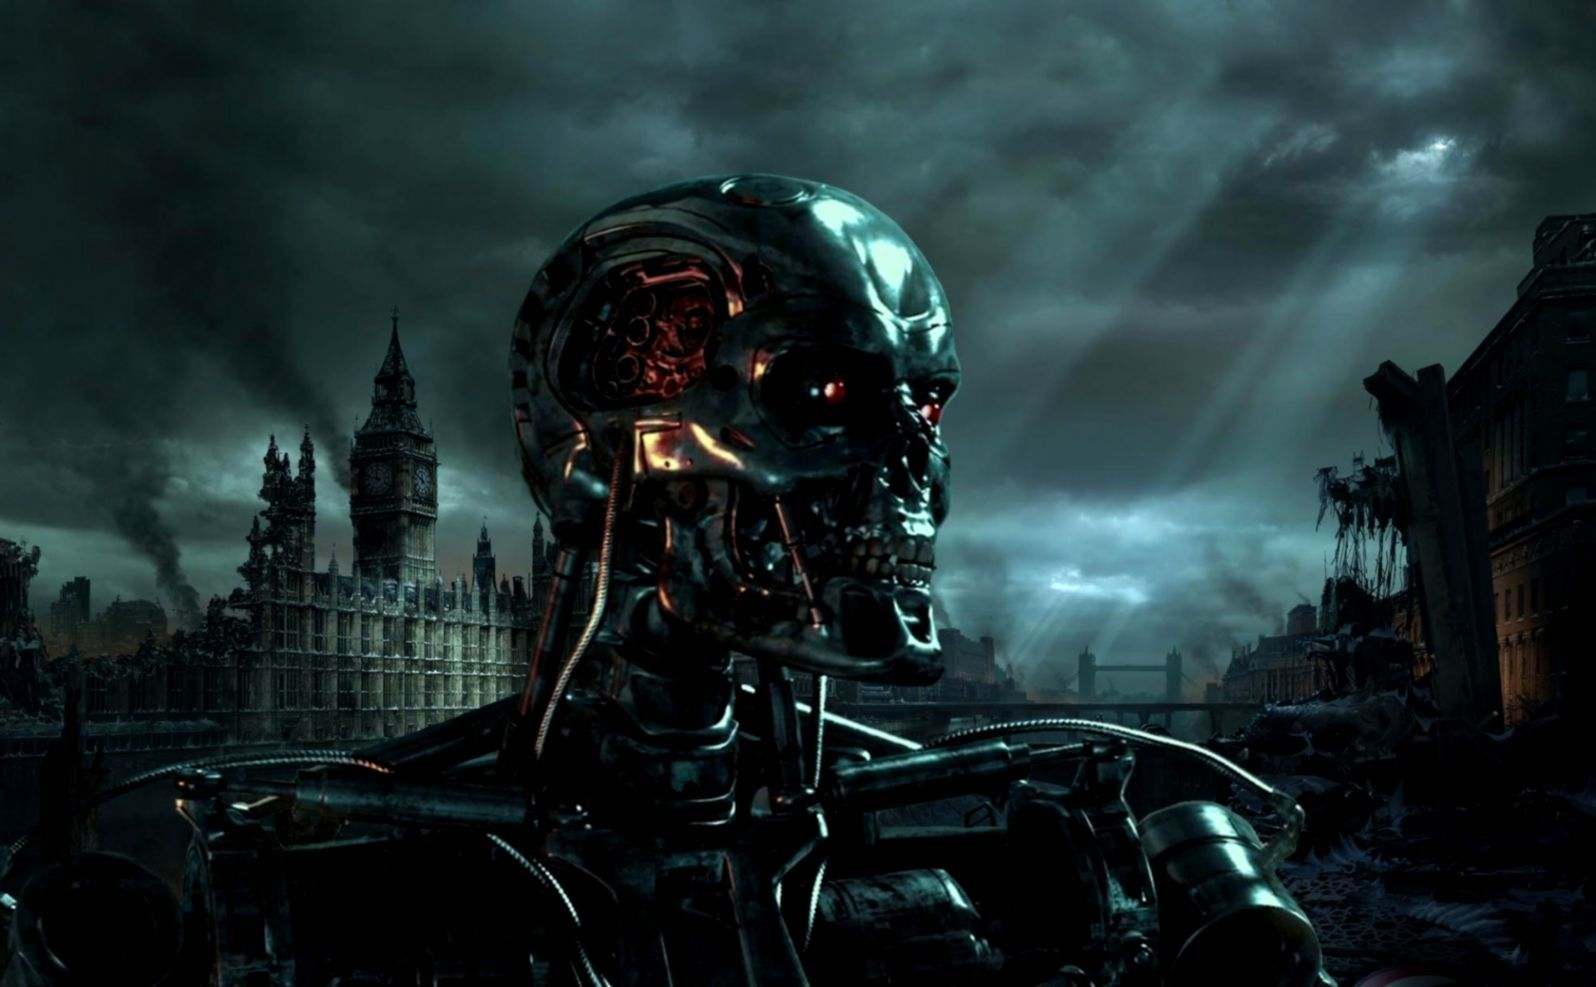 Terminator Skull Wallpapers - Top Free